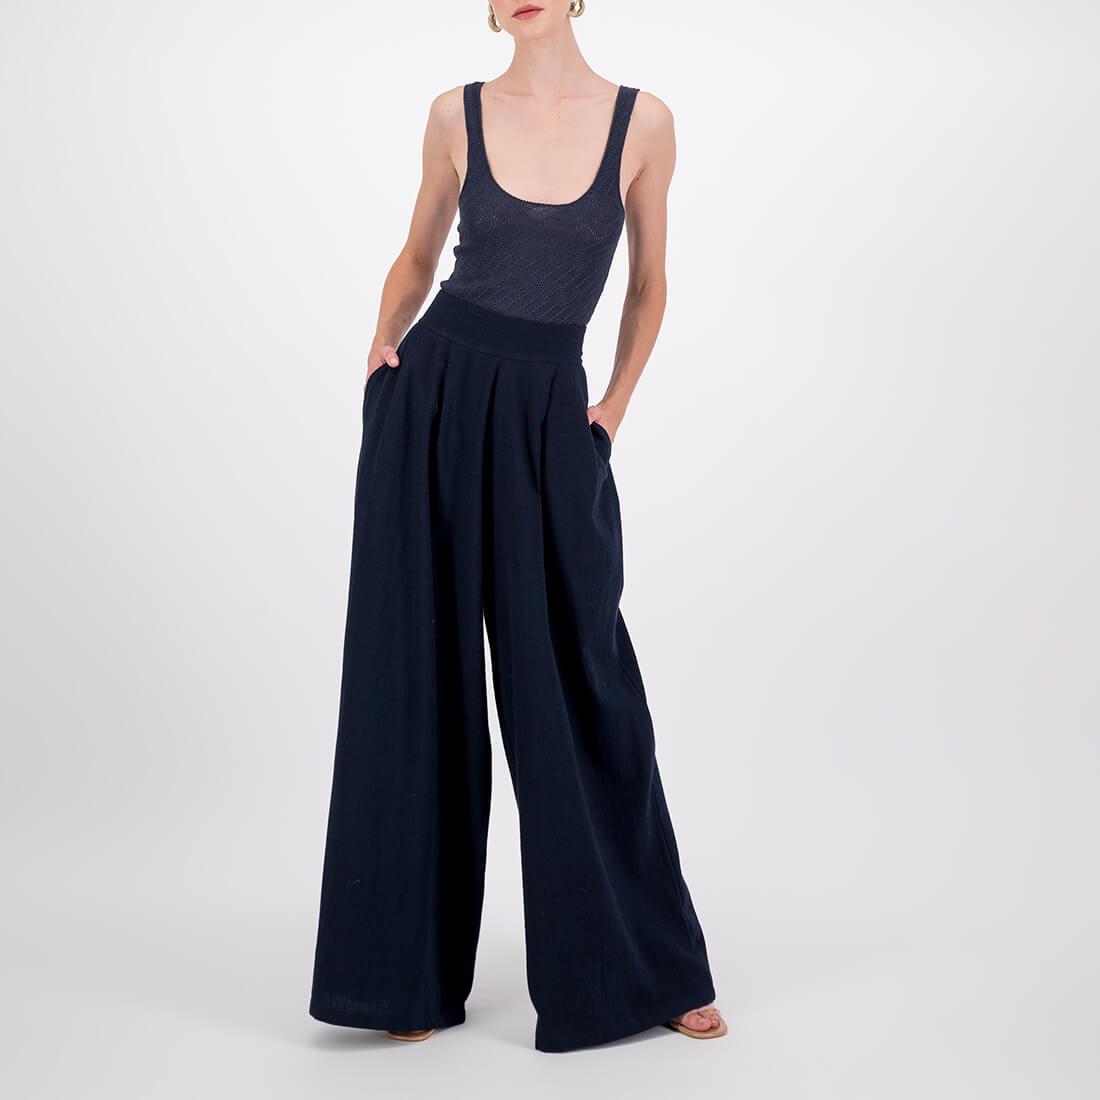 100% organic cotton high-waisted pants 2